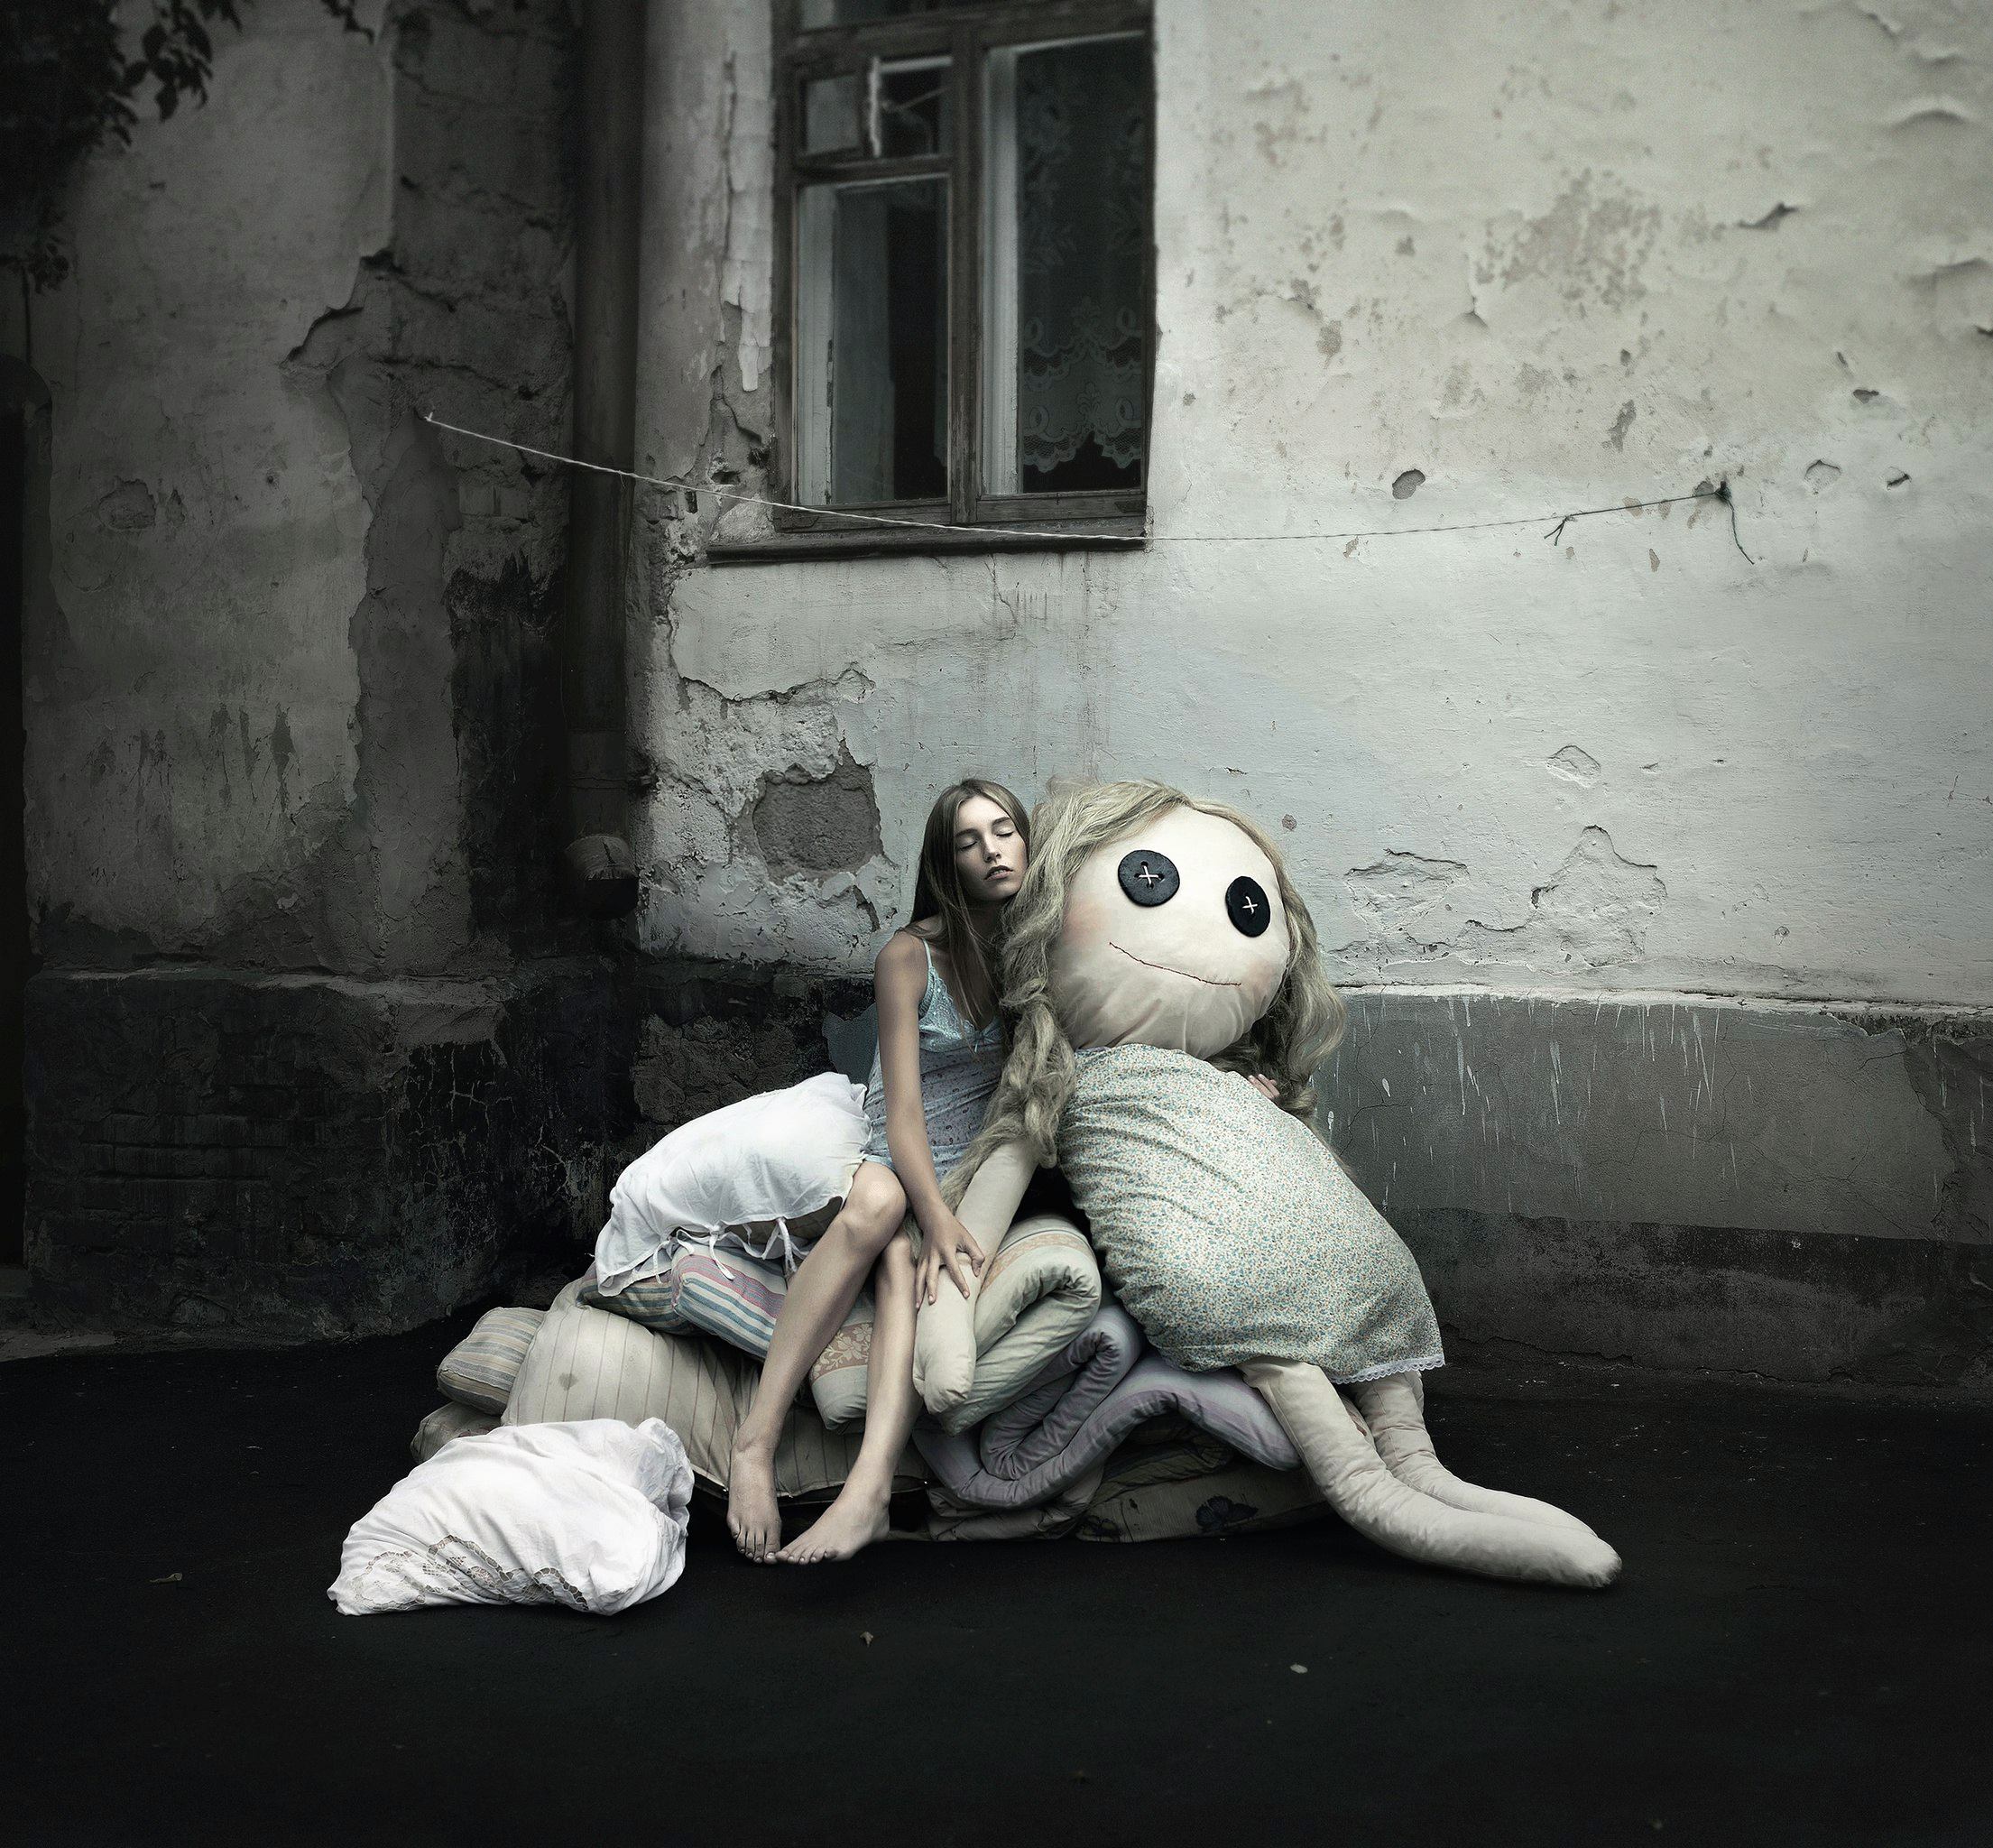 https://img4.goodfon.com/original/2209x2048/1/56/bosaia-kukla-gorod-devushka-son-okno.jpg